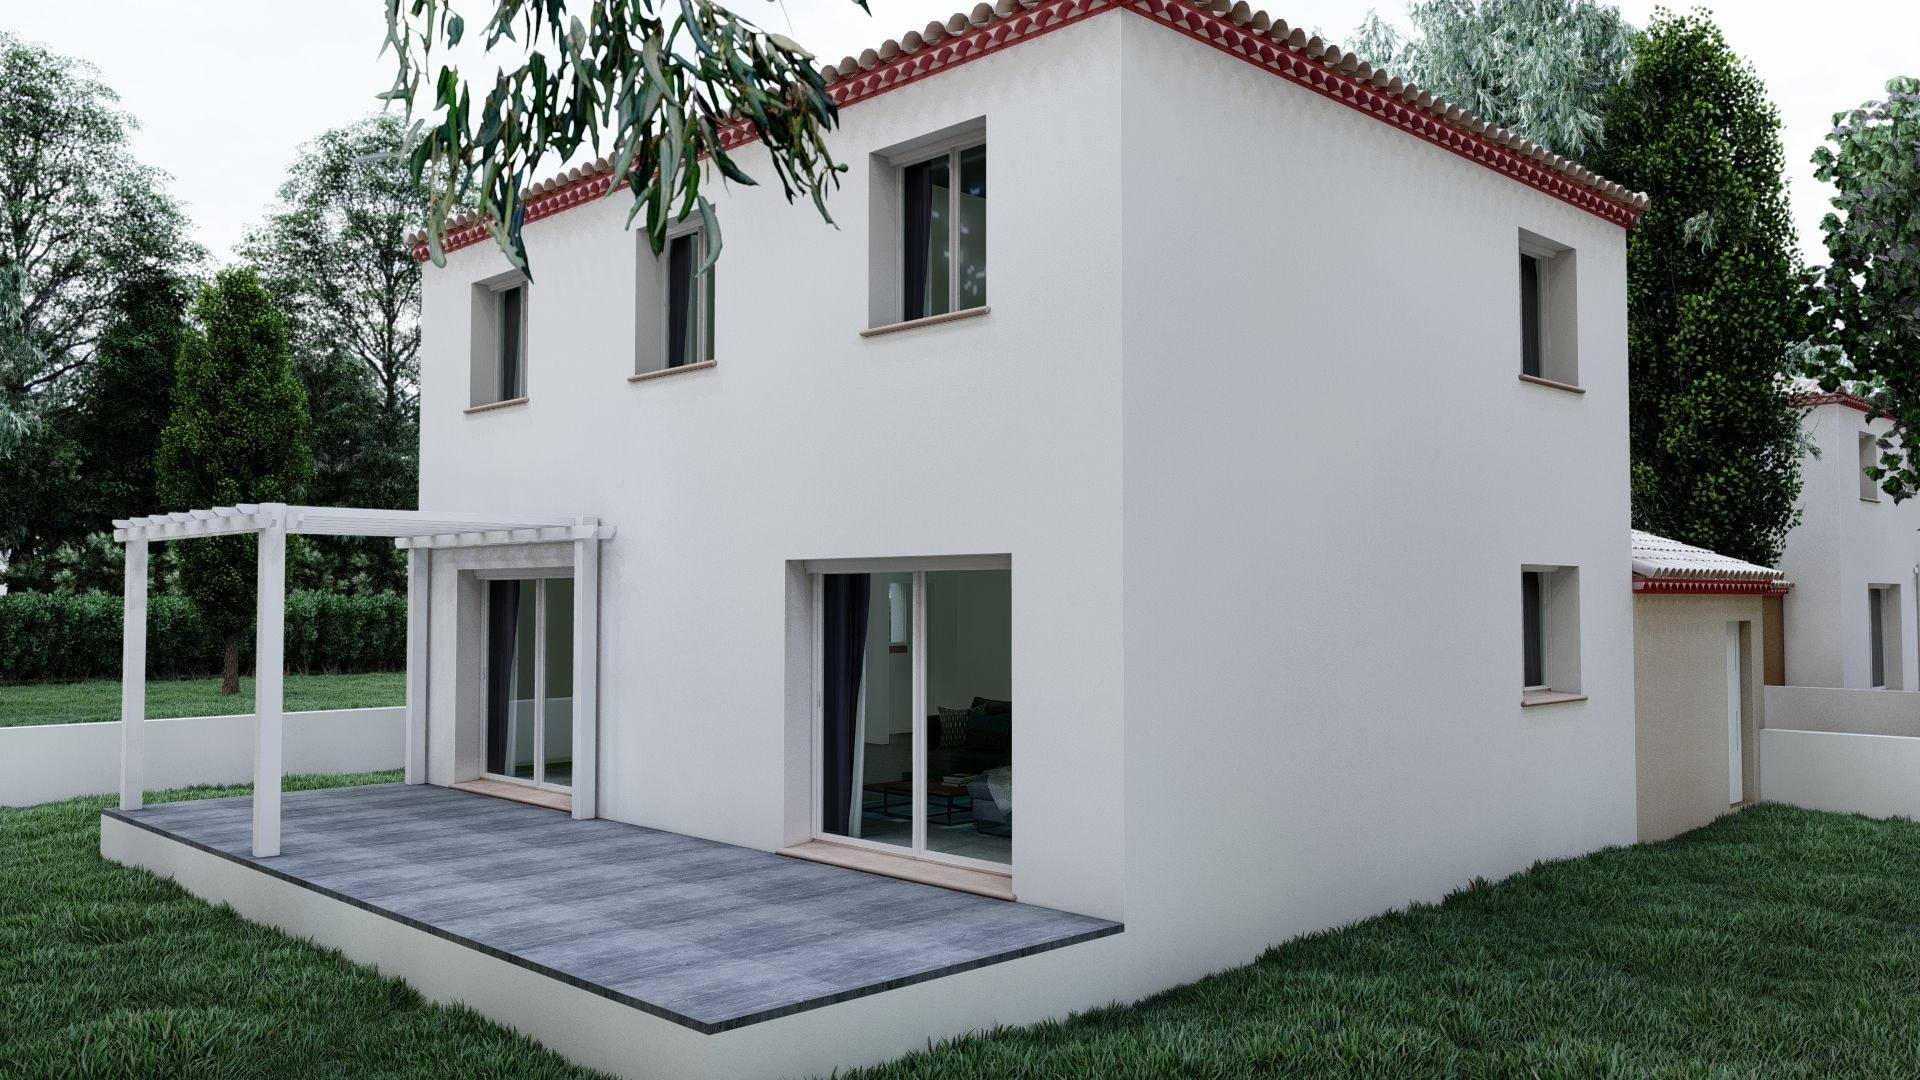 14- Bastide traditionnelle 120 m²